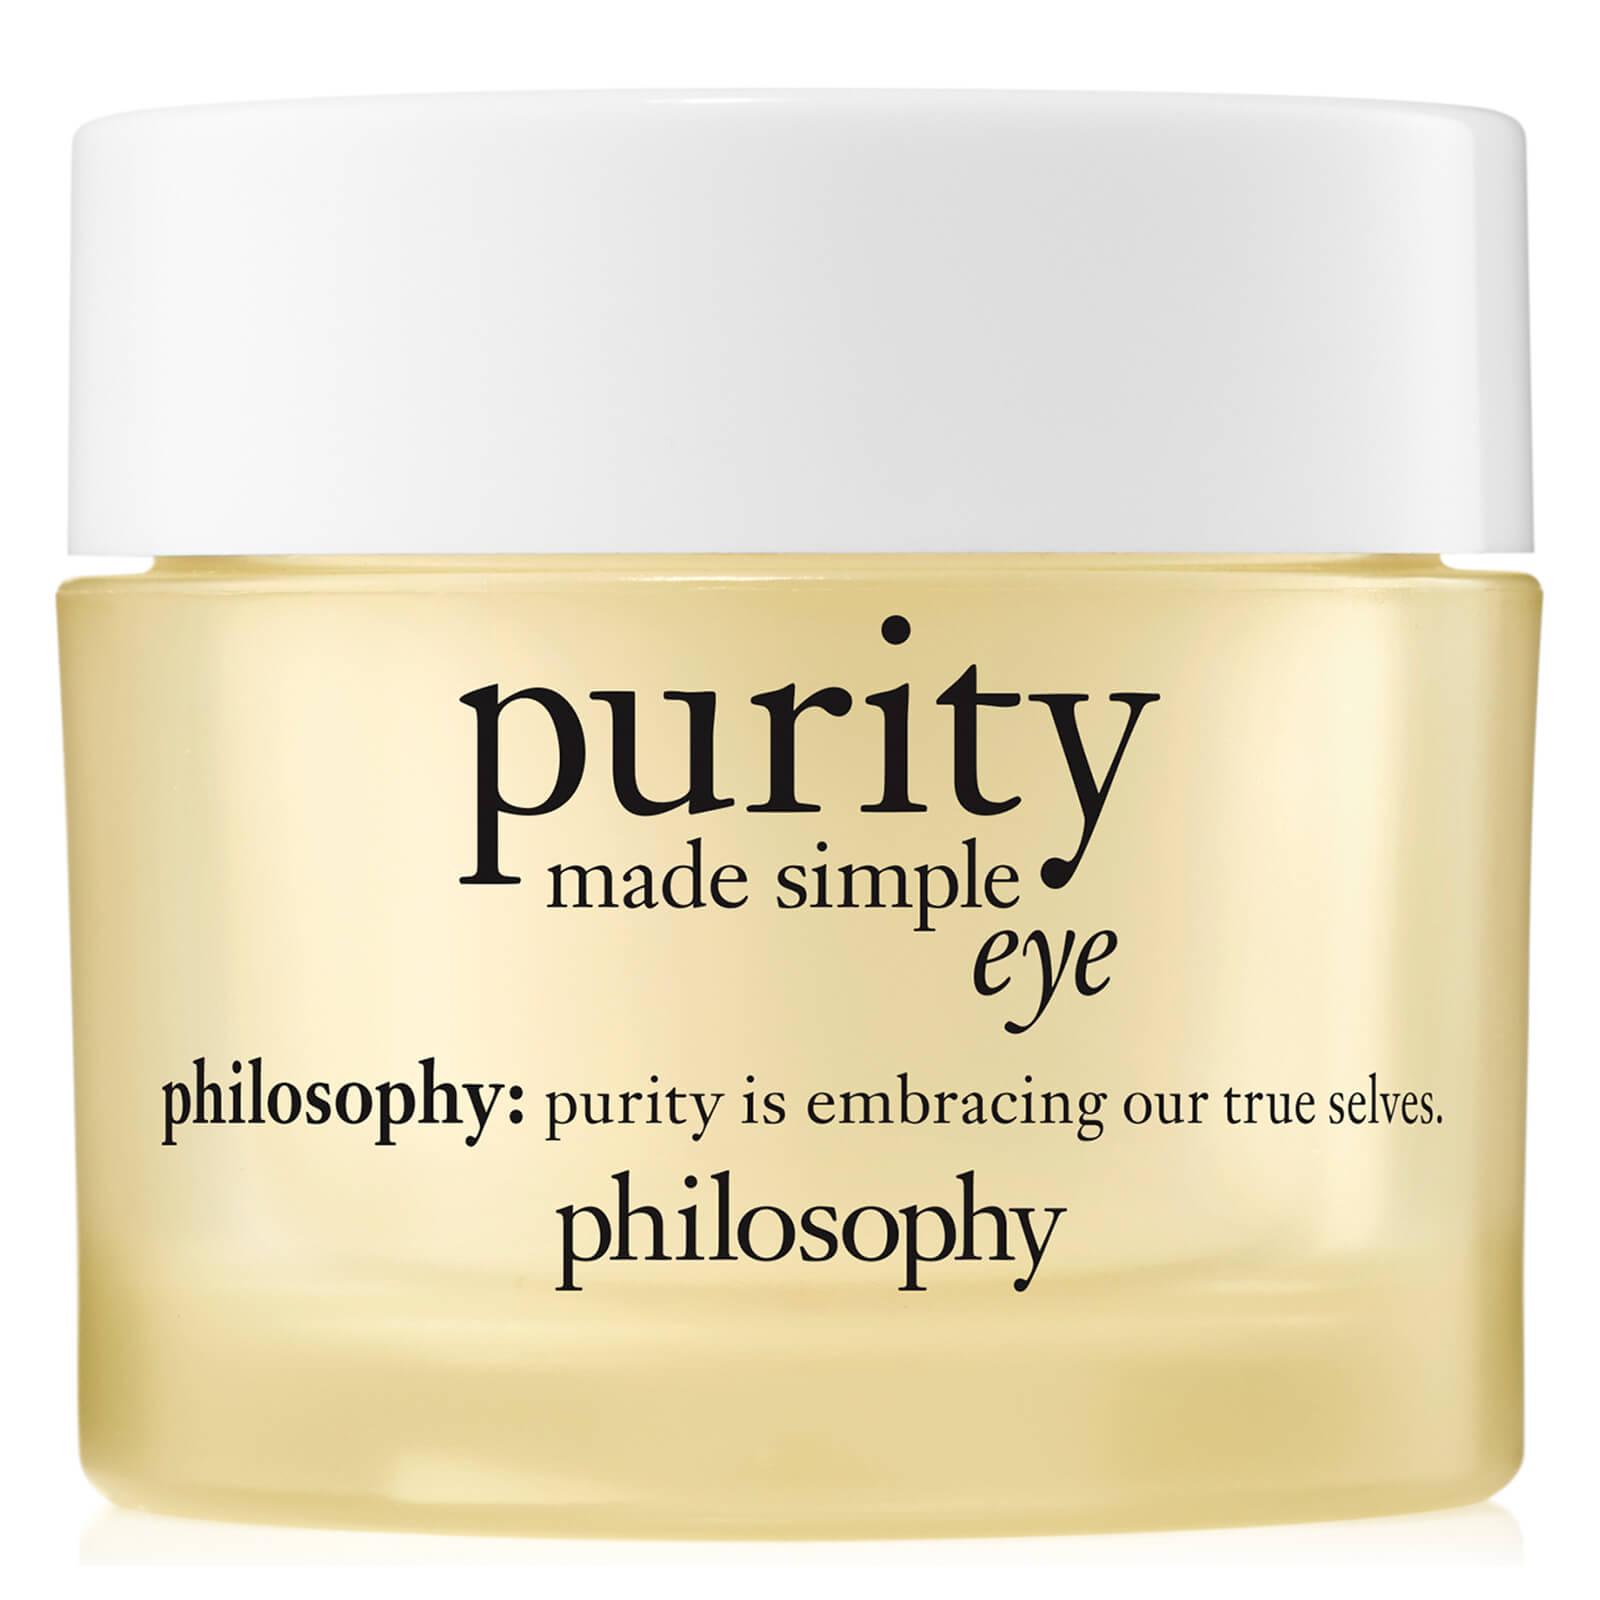 philosophy Purity Eye Gel 15ml